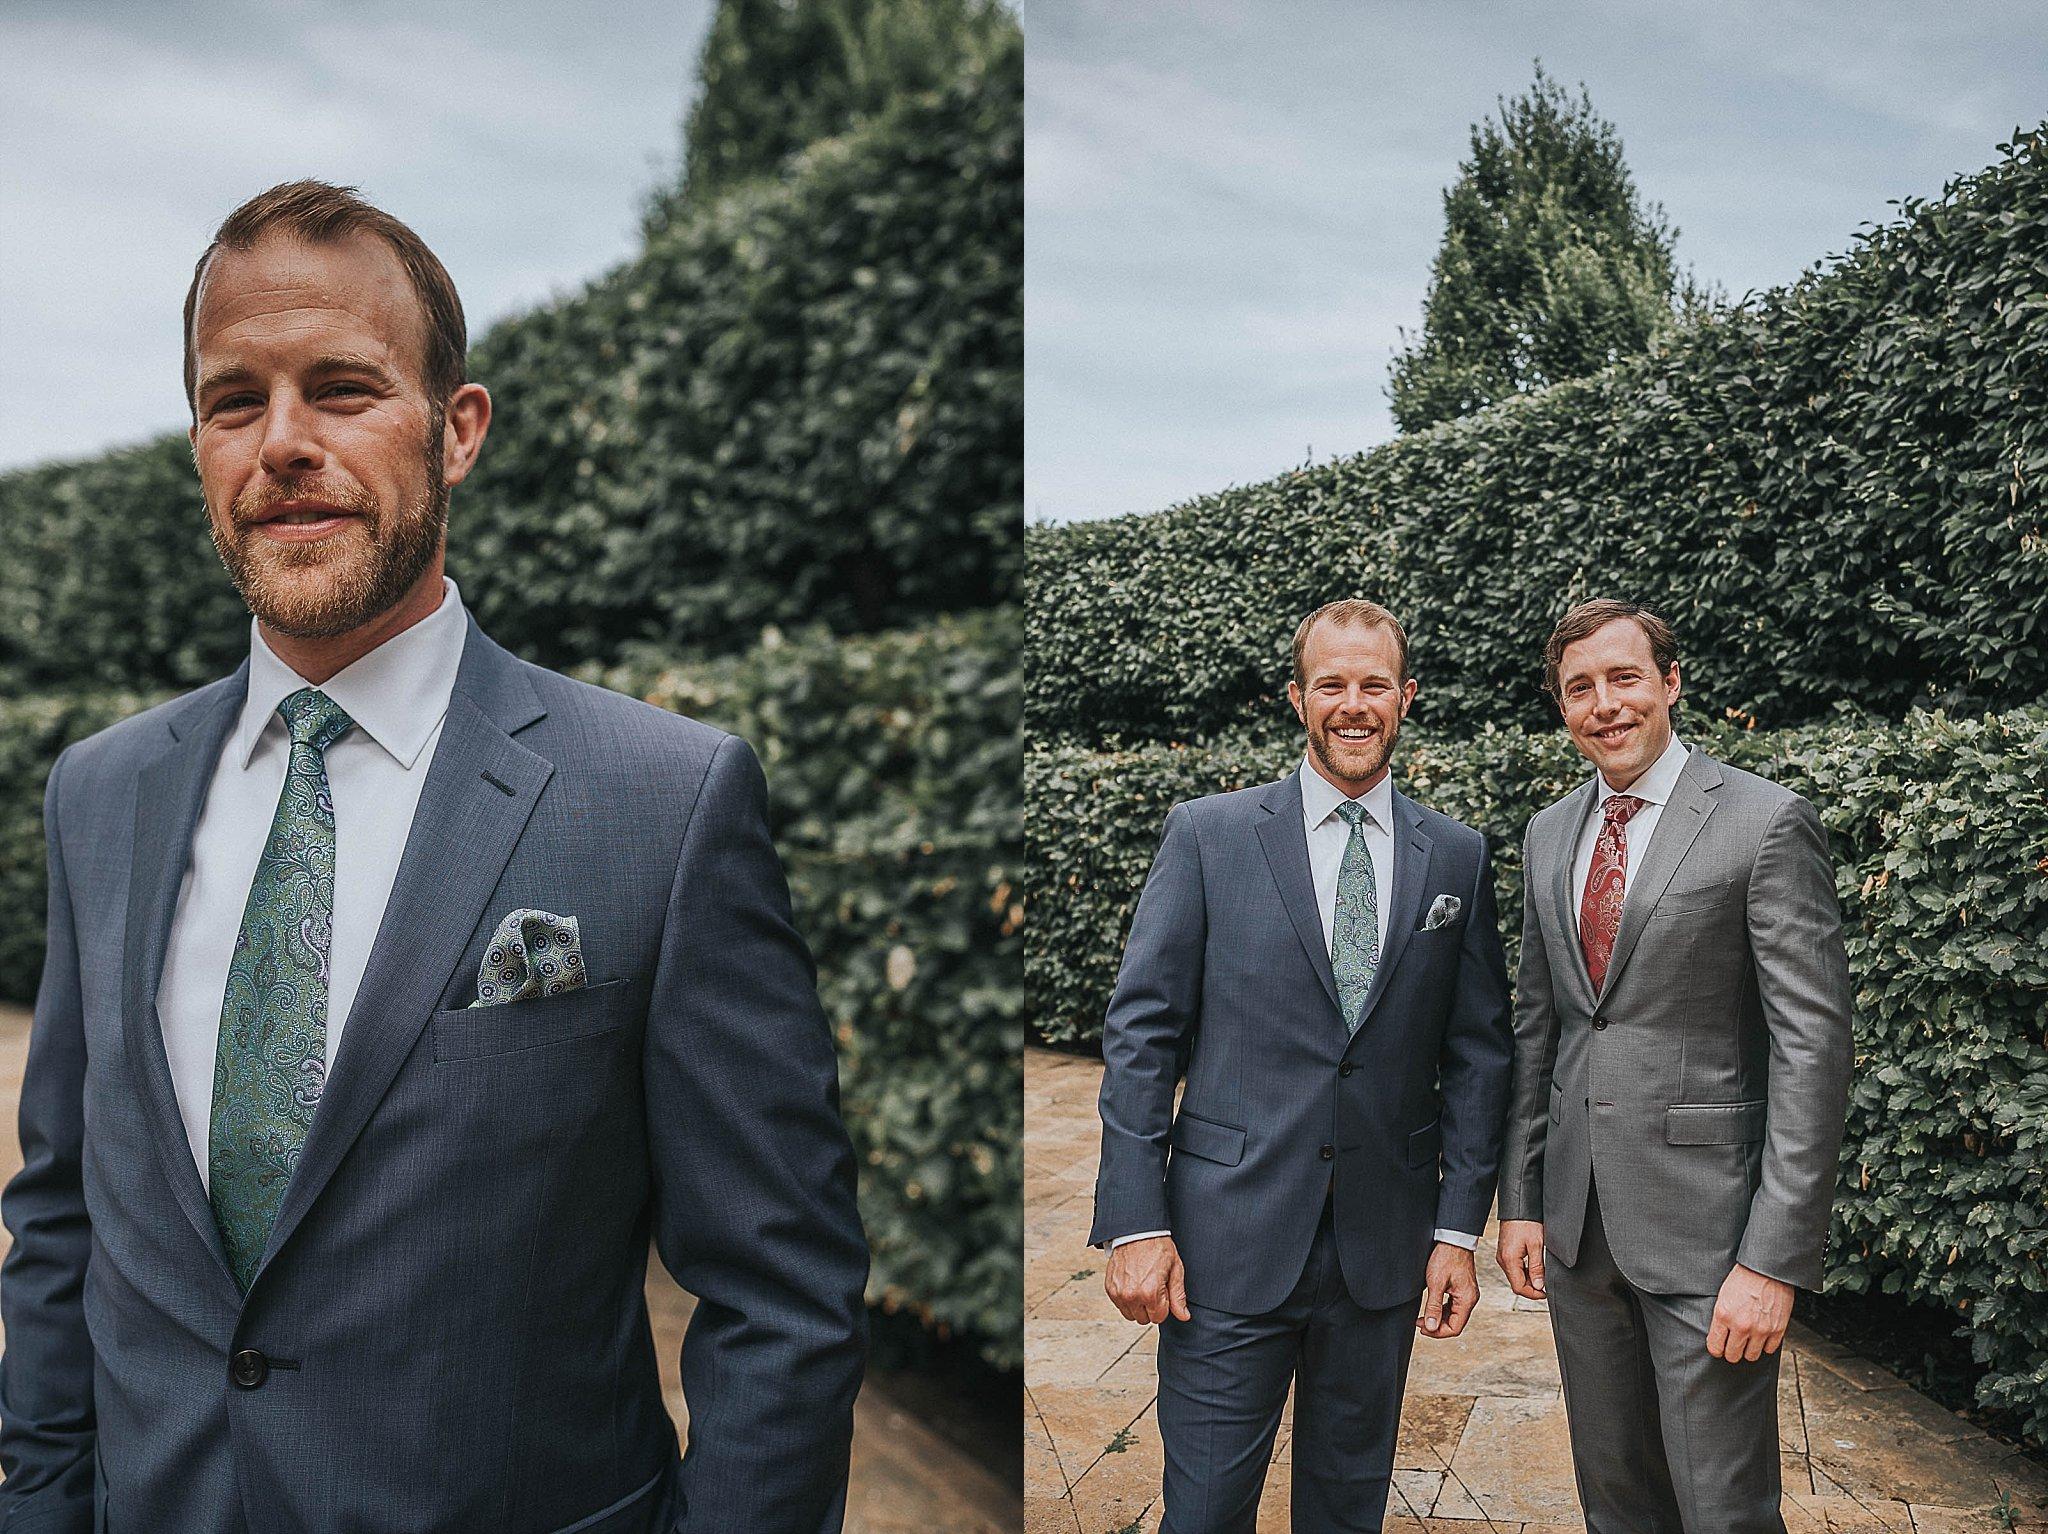 Saint Louis Wedding Photography (4).jpg